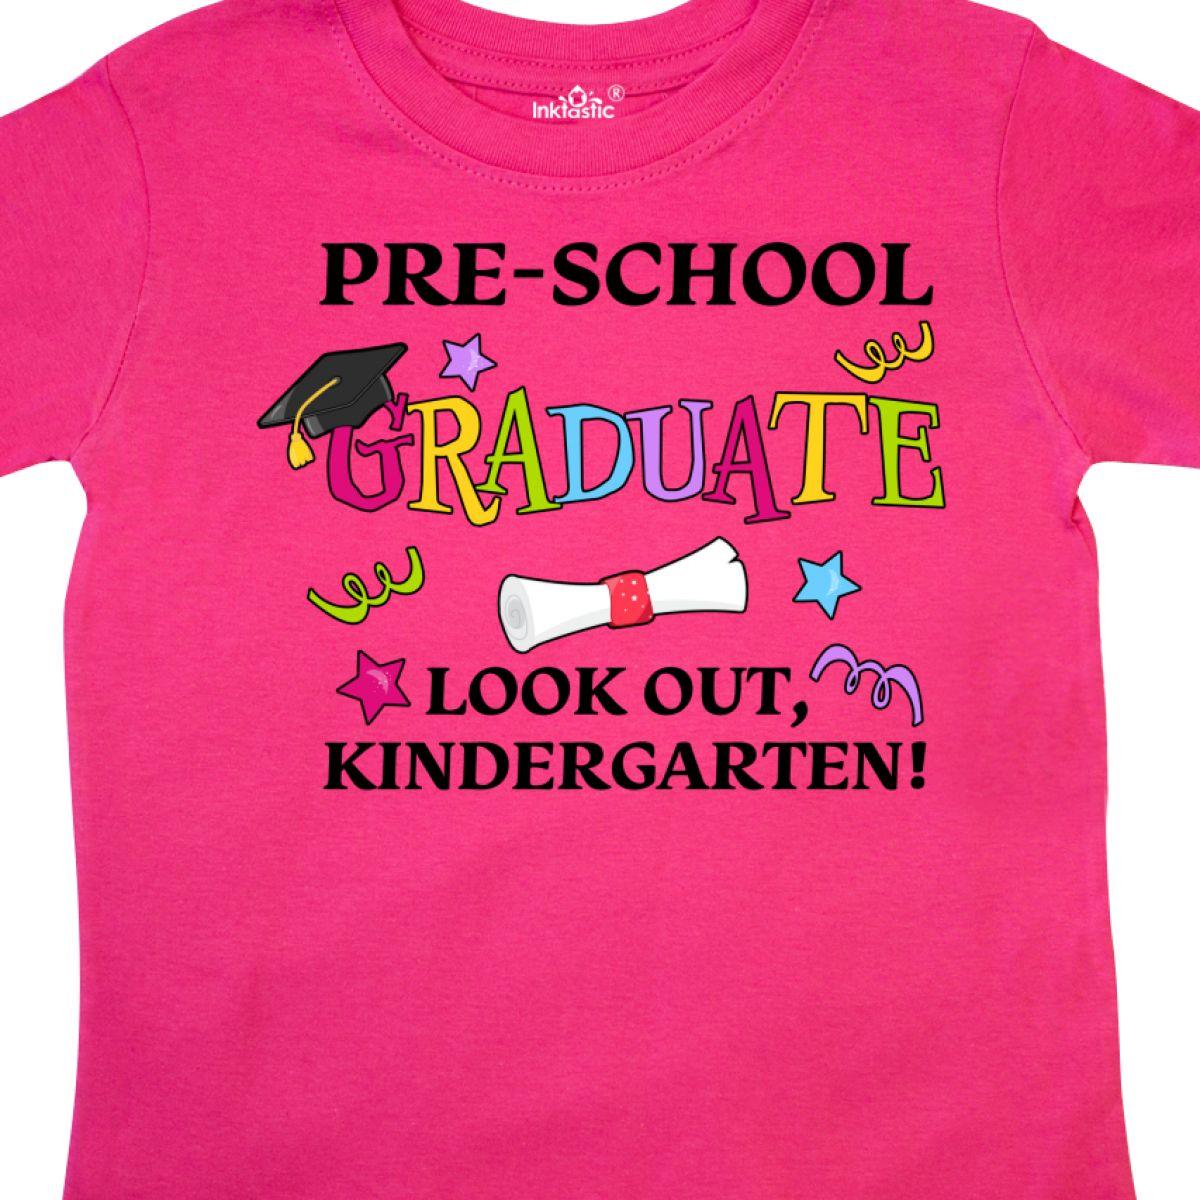 Inktastic-Pre-School-Graduate-Look-Out-Kindergarten-Toddler-T-Shirt-Graduation thumbnail 6